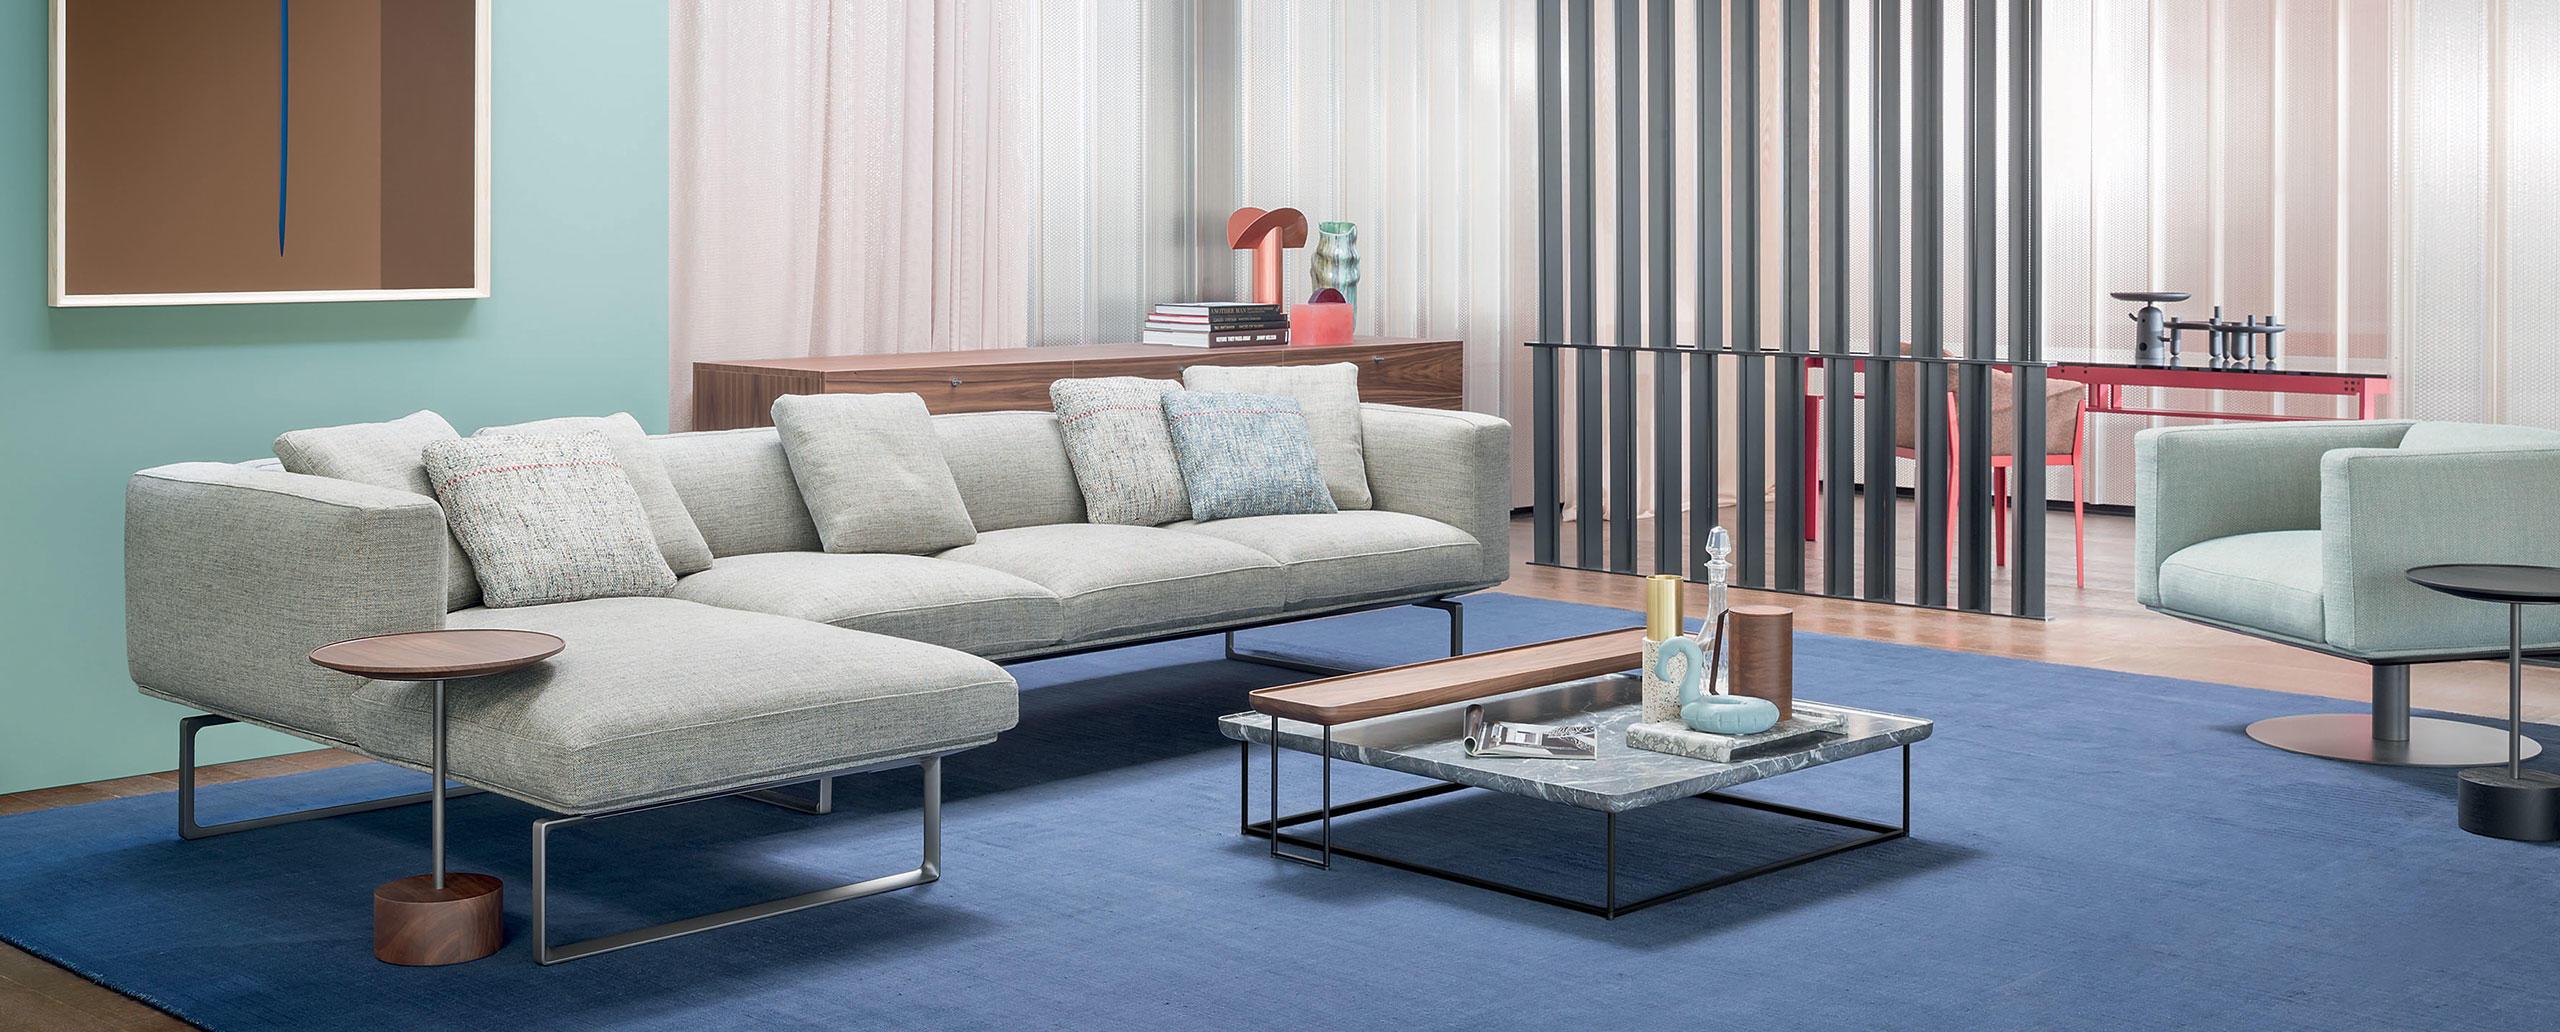 Sofá de diseño de Cassina disponible en Batavia